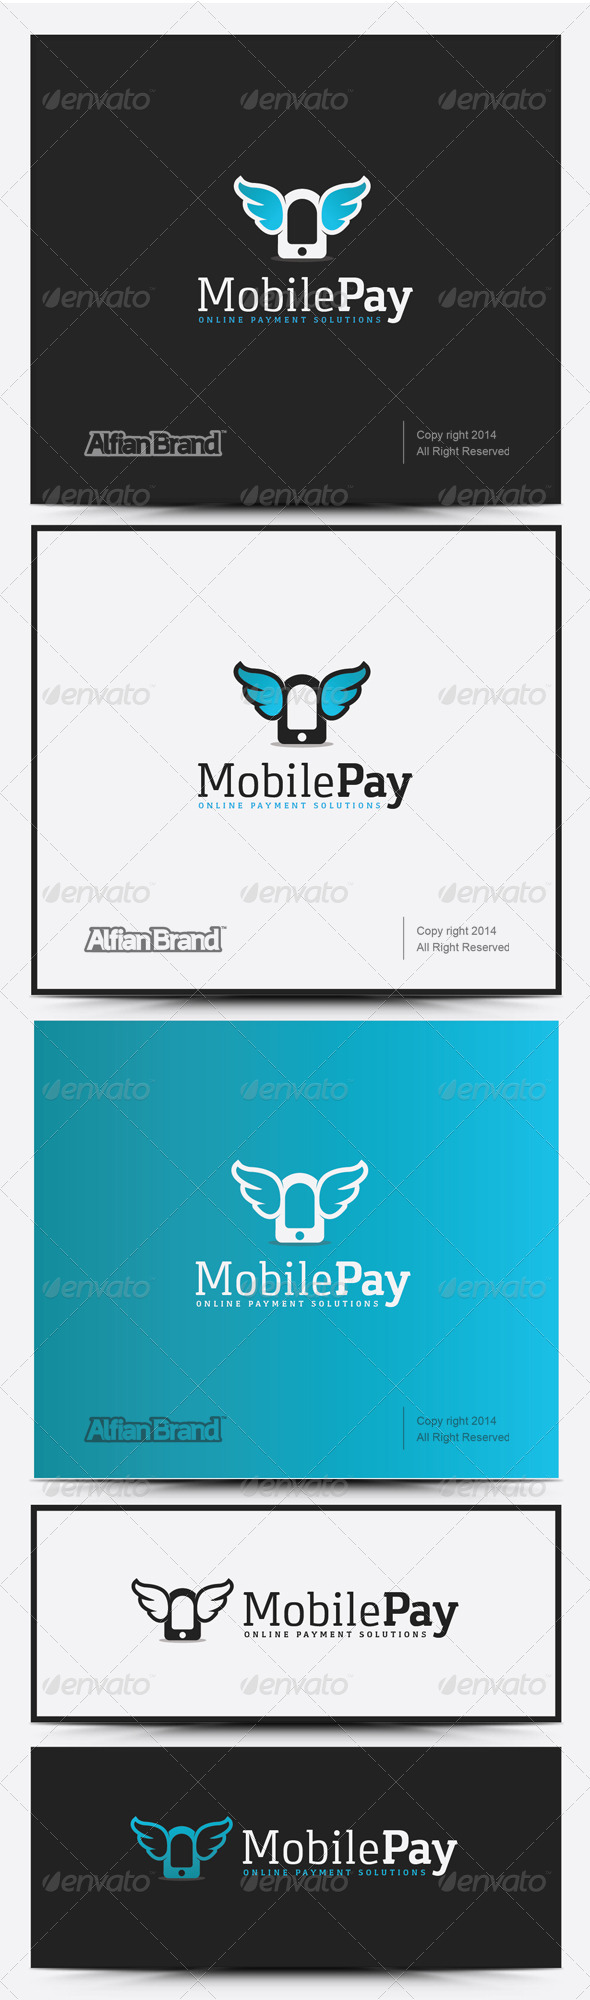 GraphicRiver Mobile Pay Logo 8232118